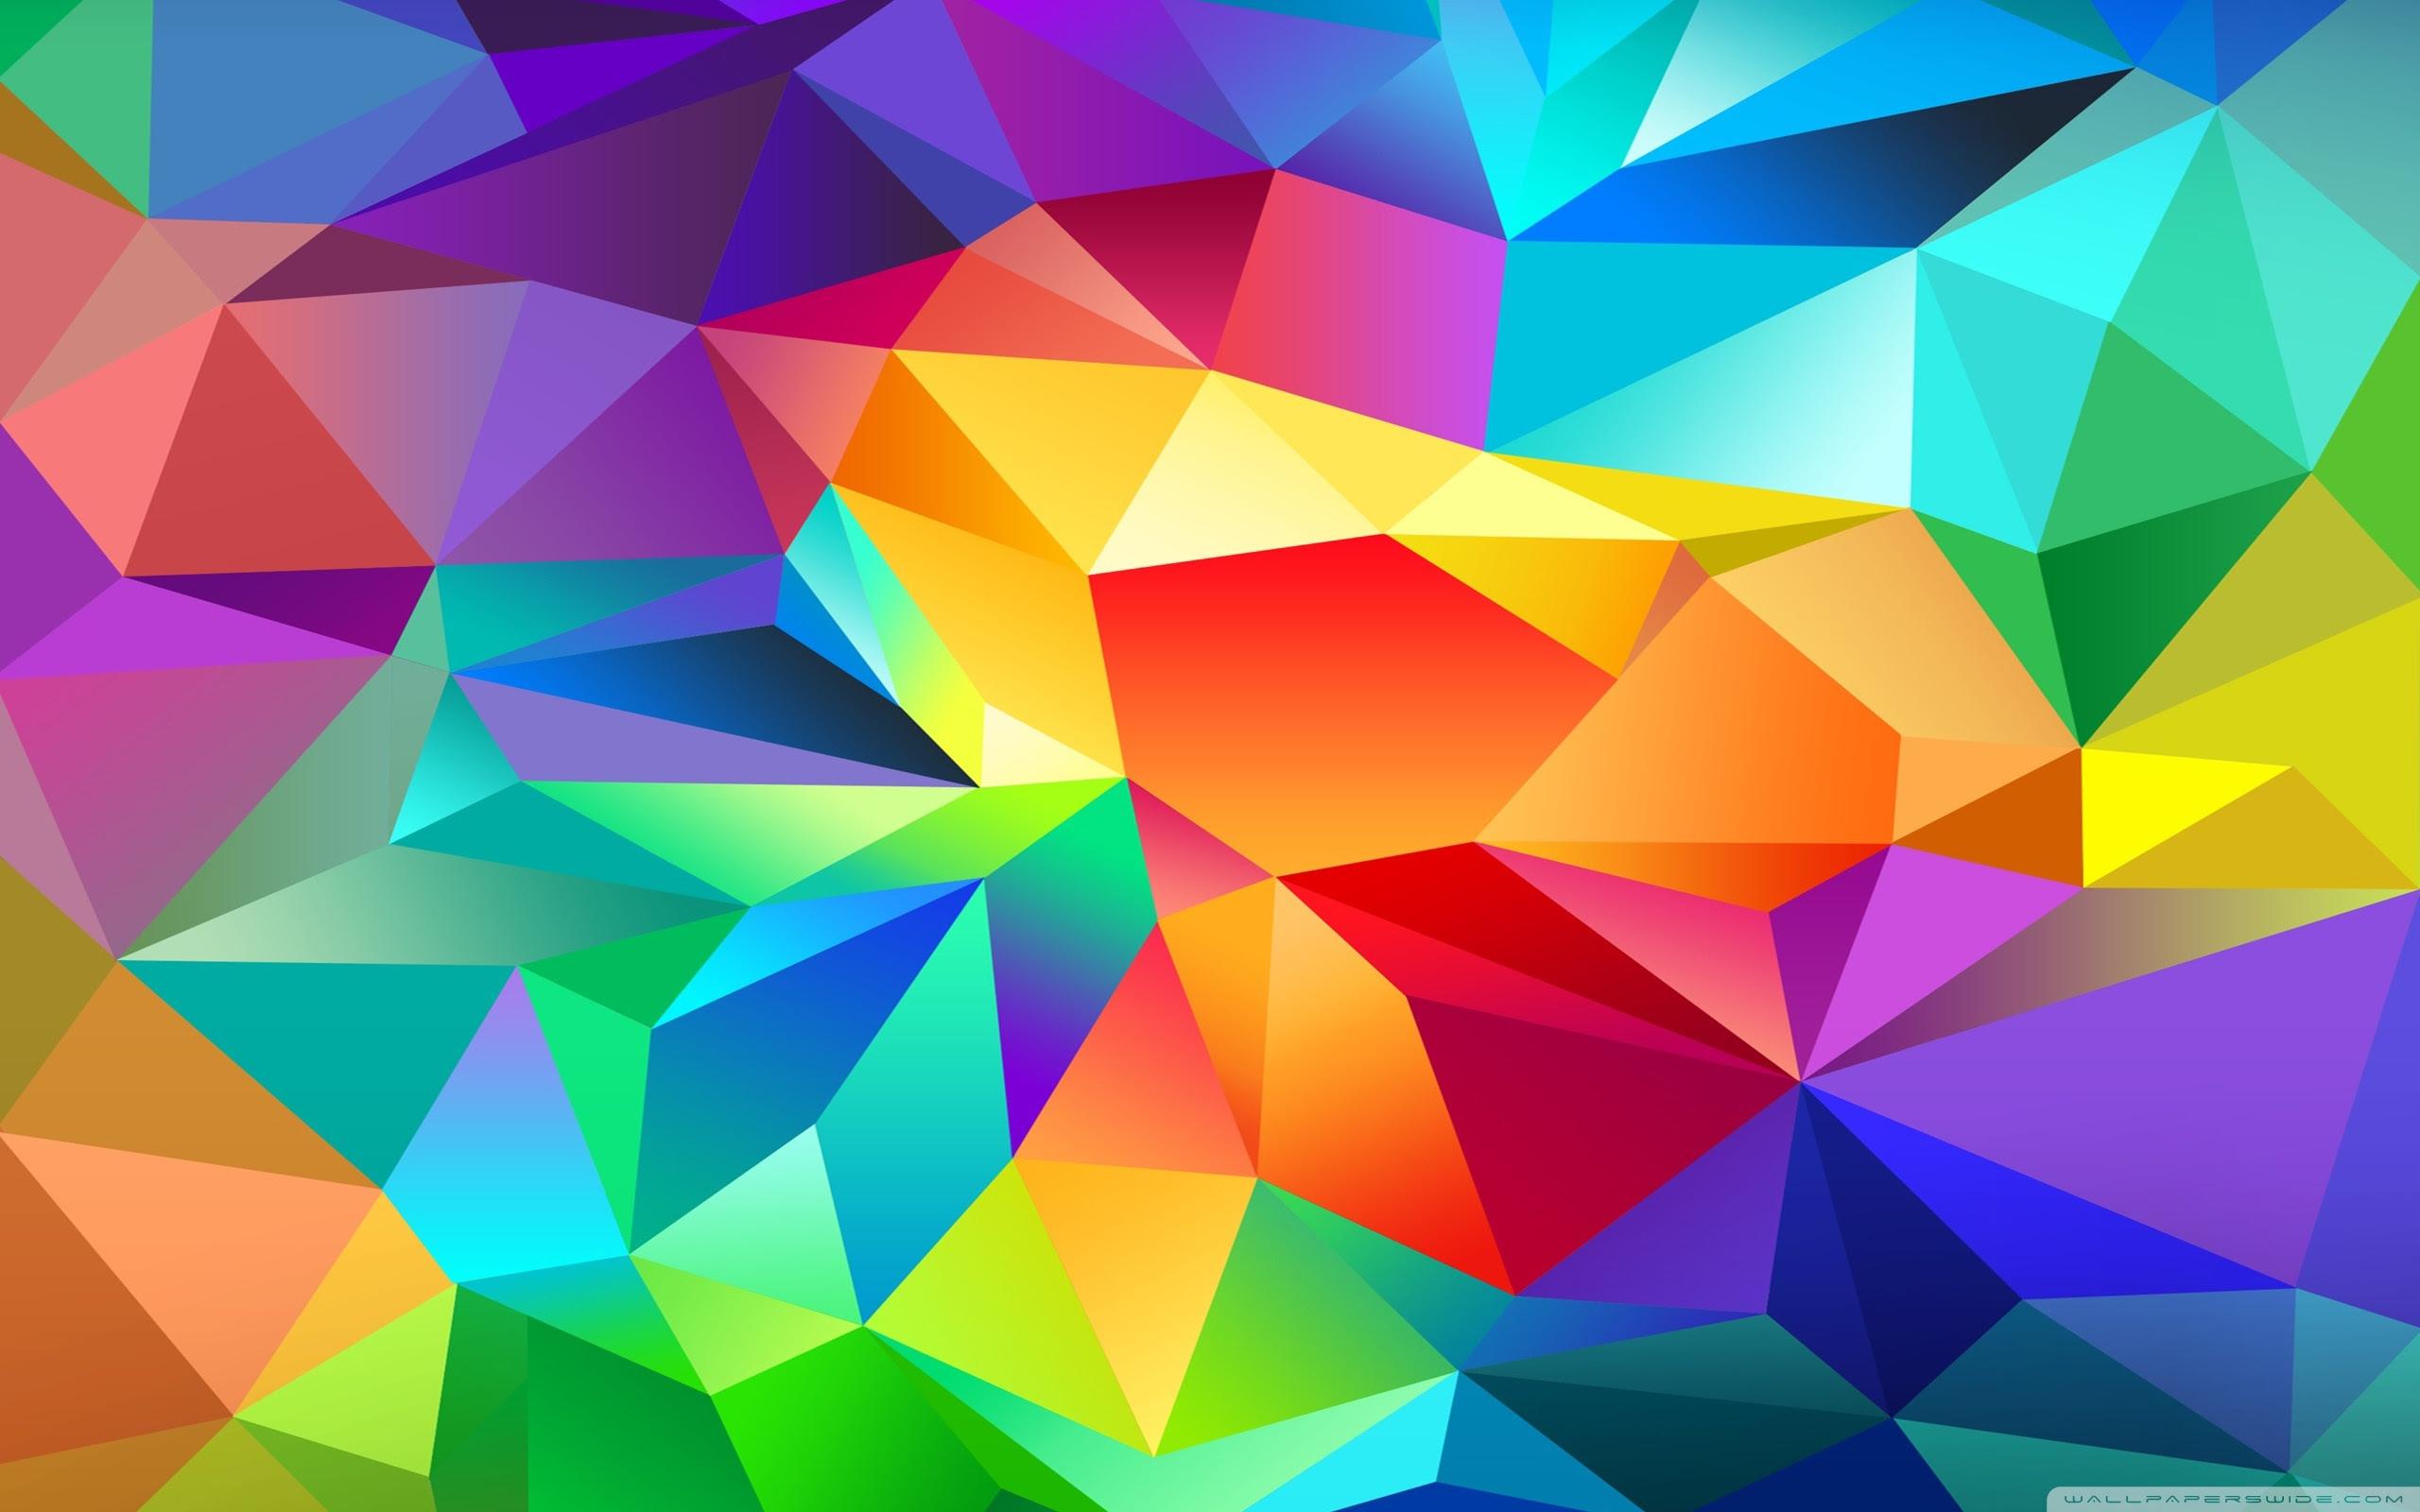 Galaxy S5 Ultra HD Desktop Background Wallpaper For 4K UHD